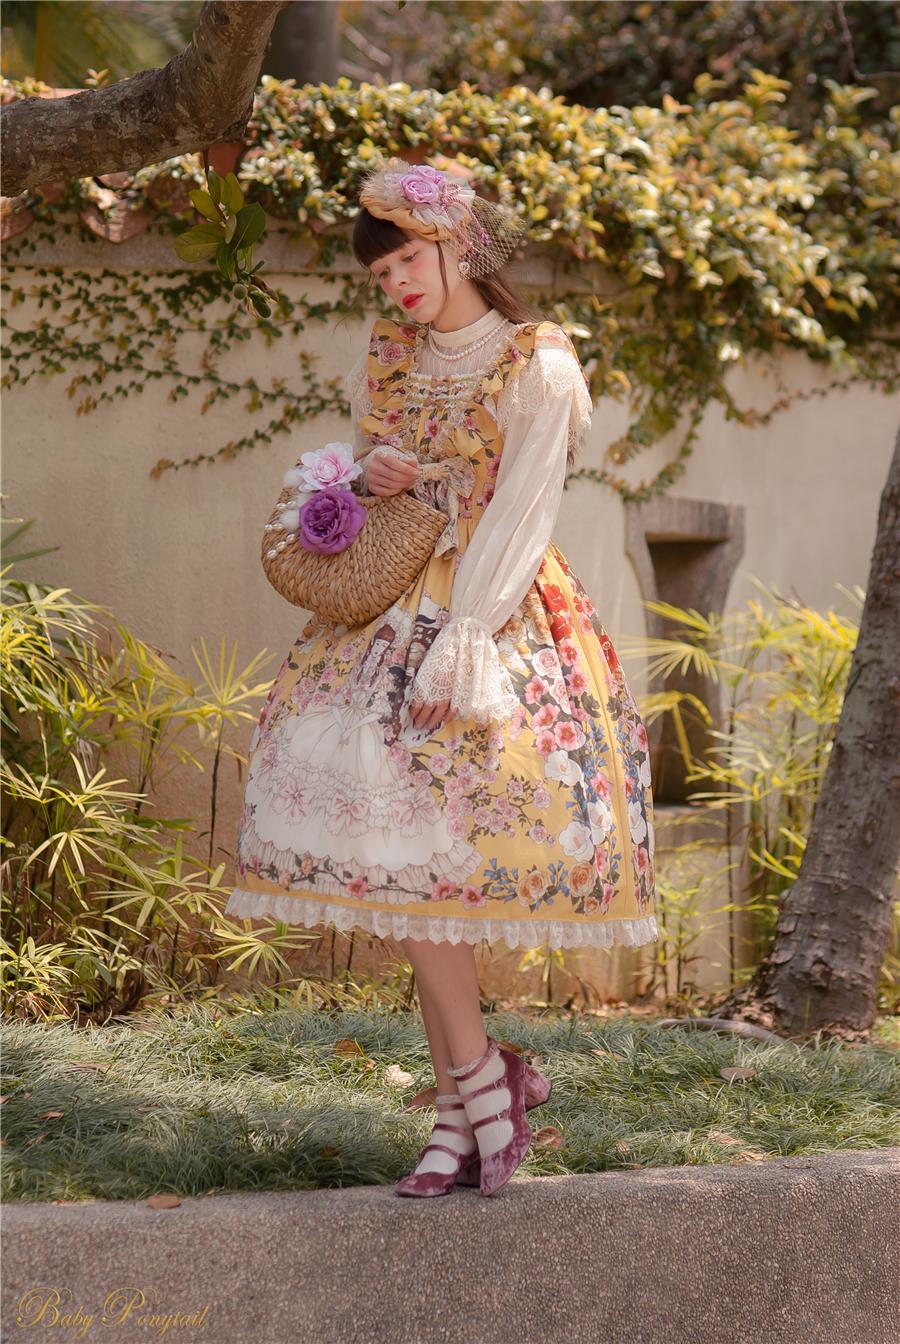 Baby Ponytail_Model Photo_Polly's Garden of Dreams_JSK Yellow_Claudia_12.jpg